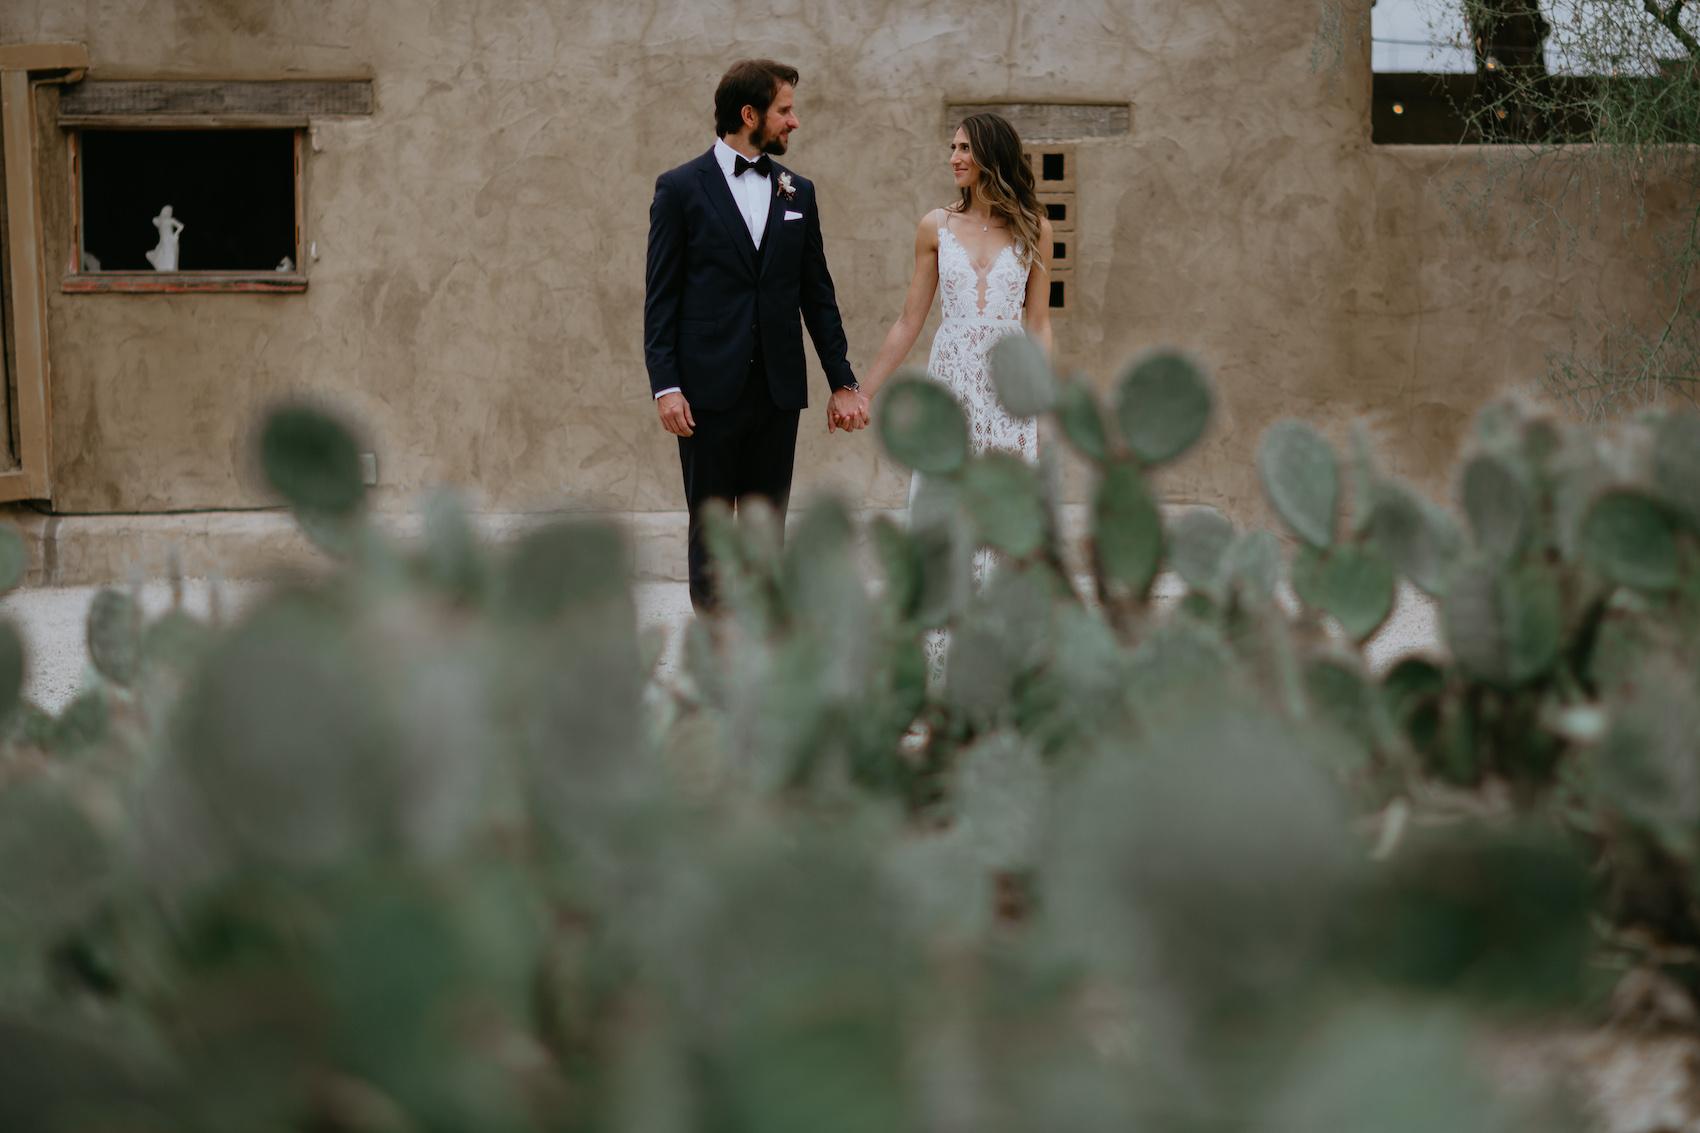 29-Palms-Inn-Joshua-Tree-Jewish-Wedding-H+M-26.jpg